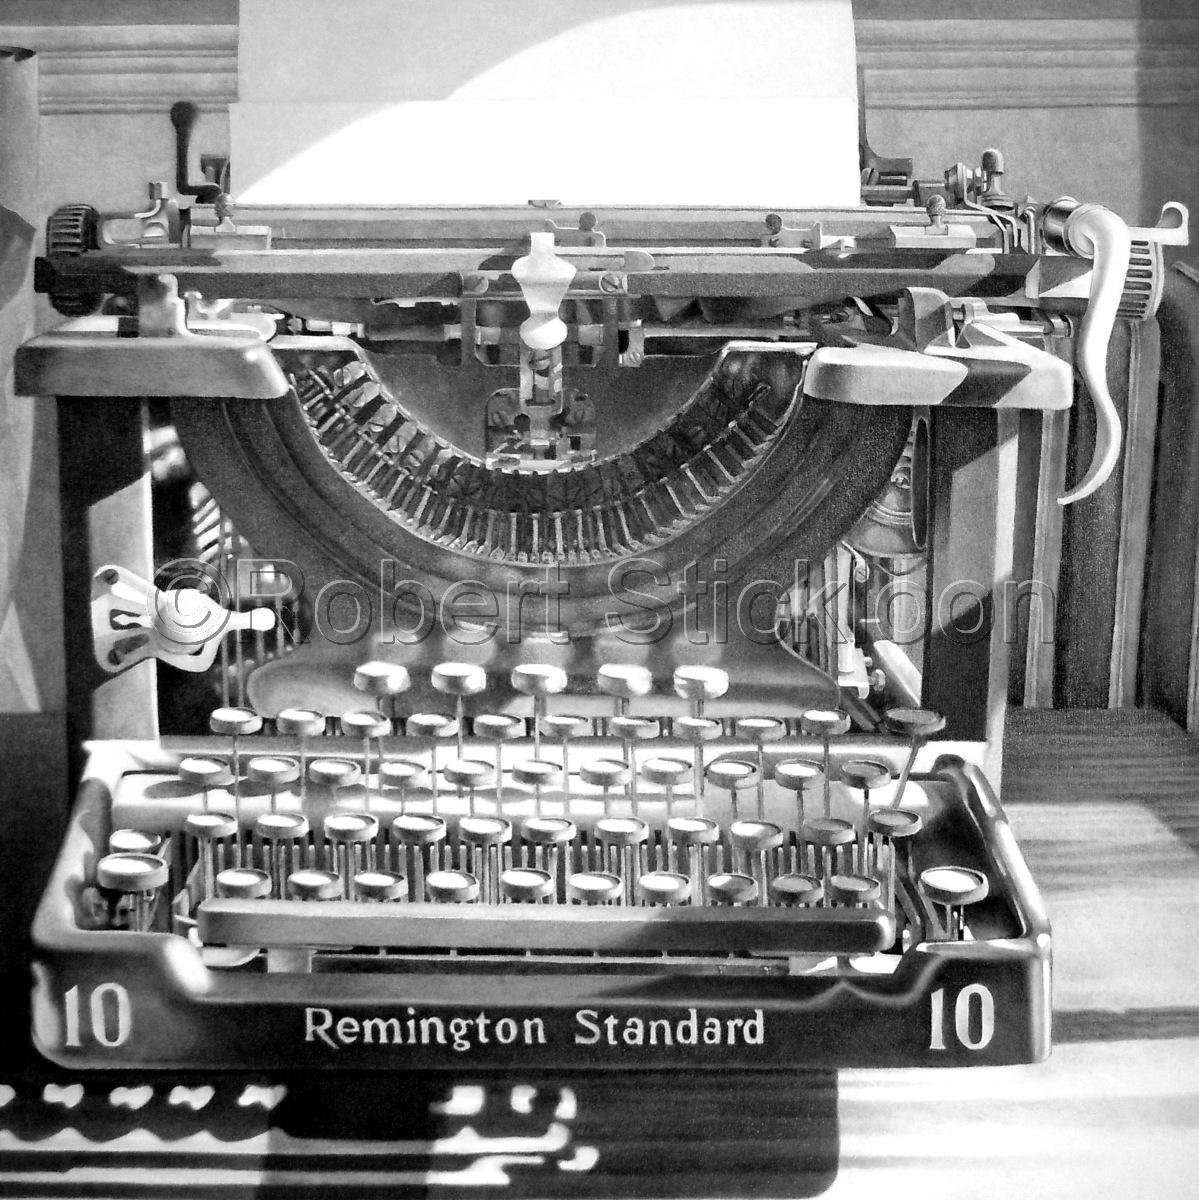 Remington Standard (large view)